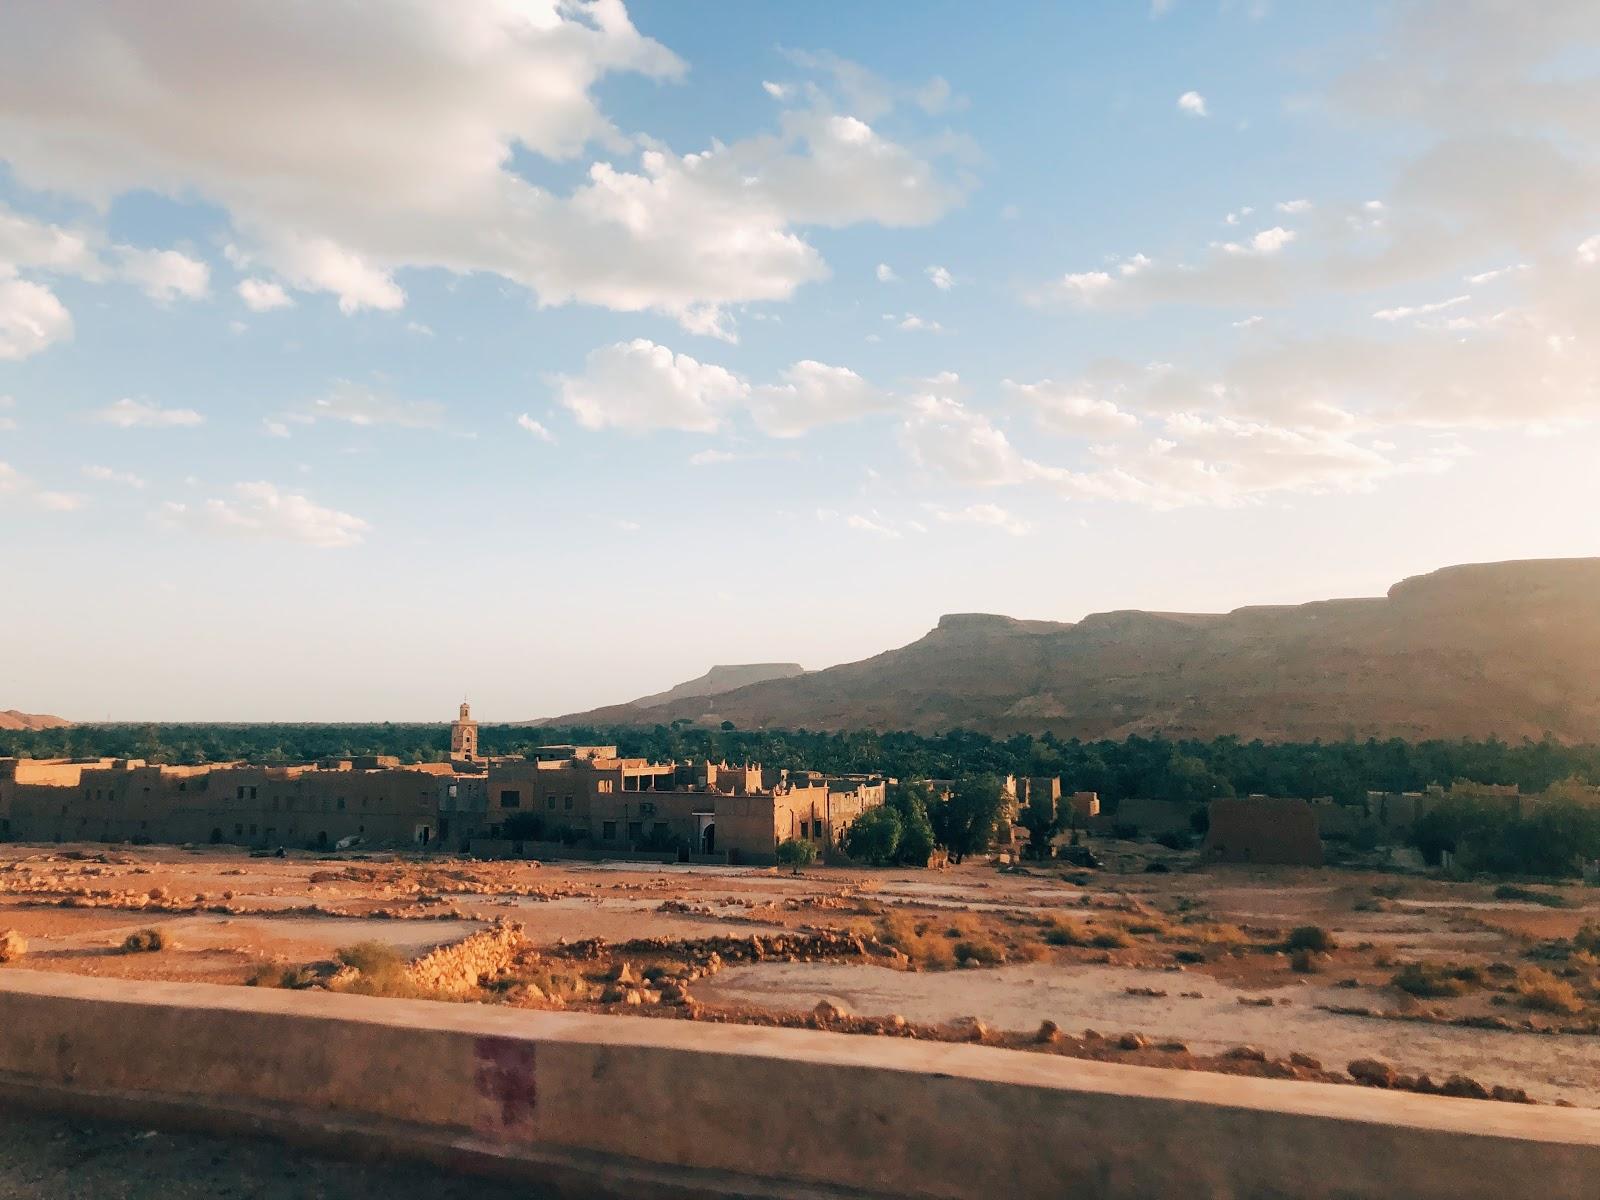 traveler-review-morocco-vacation-haley-vallee-du-ziz.jpg